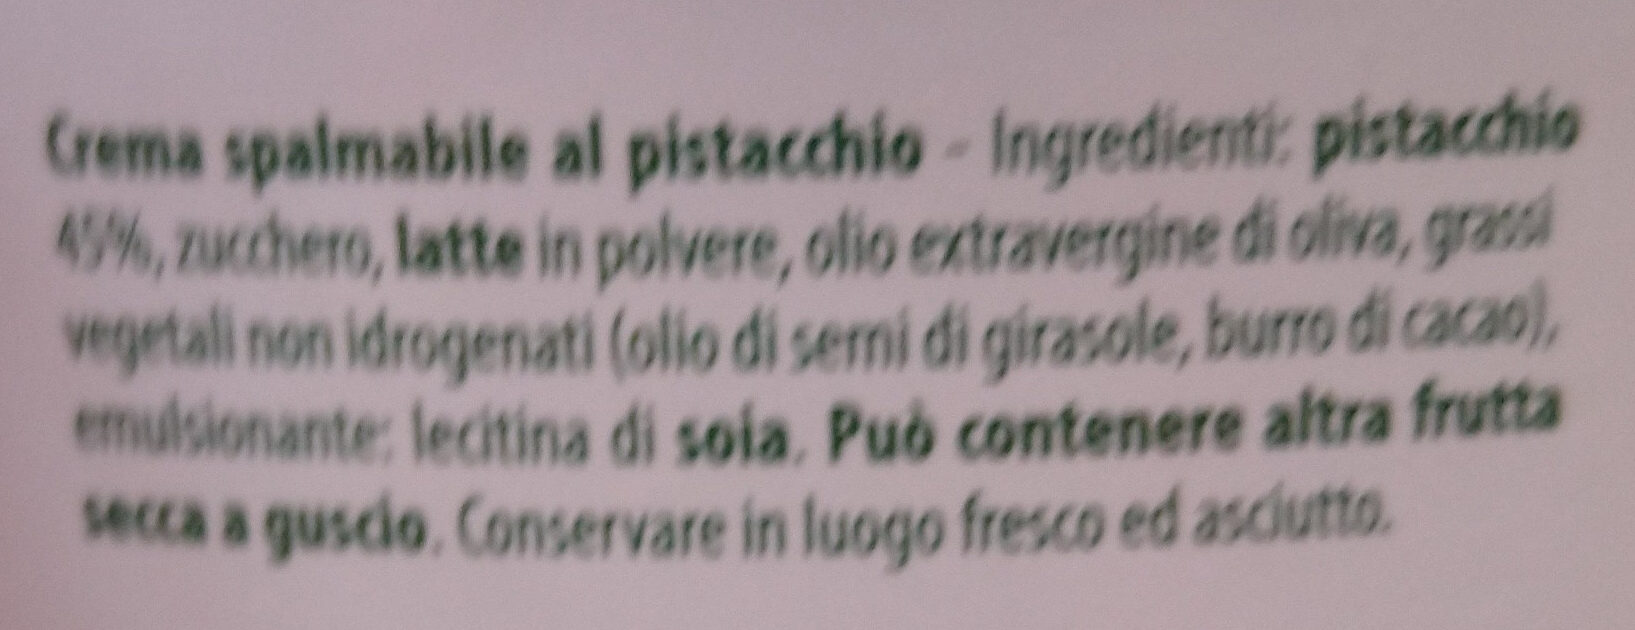 Crema spalmabile al pistacchio - Ingredienti - it